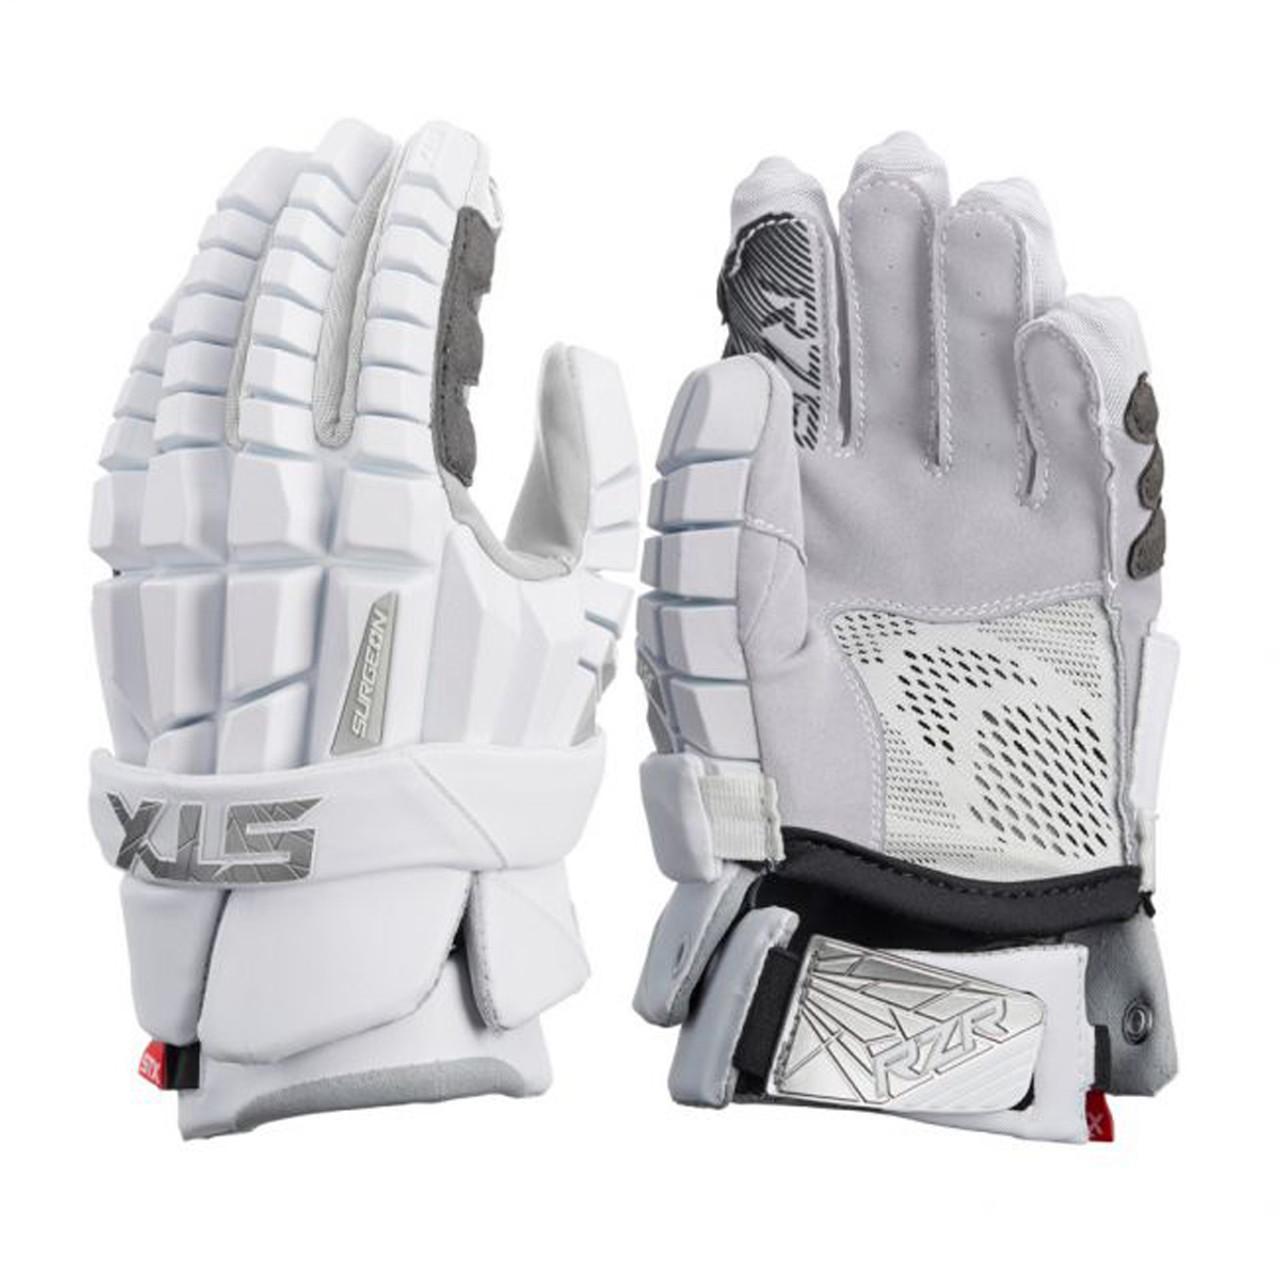 Small STX Lacrosse Surgeon 400 Arm Pad White